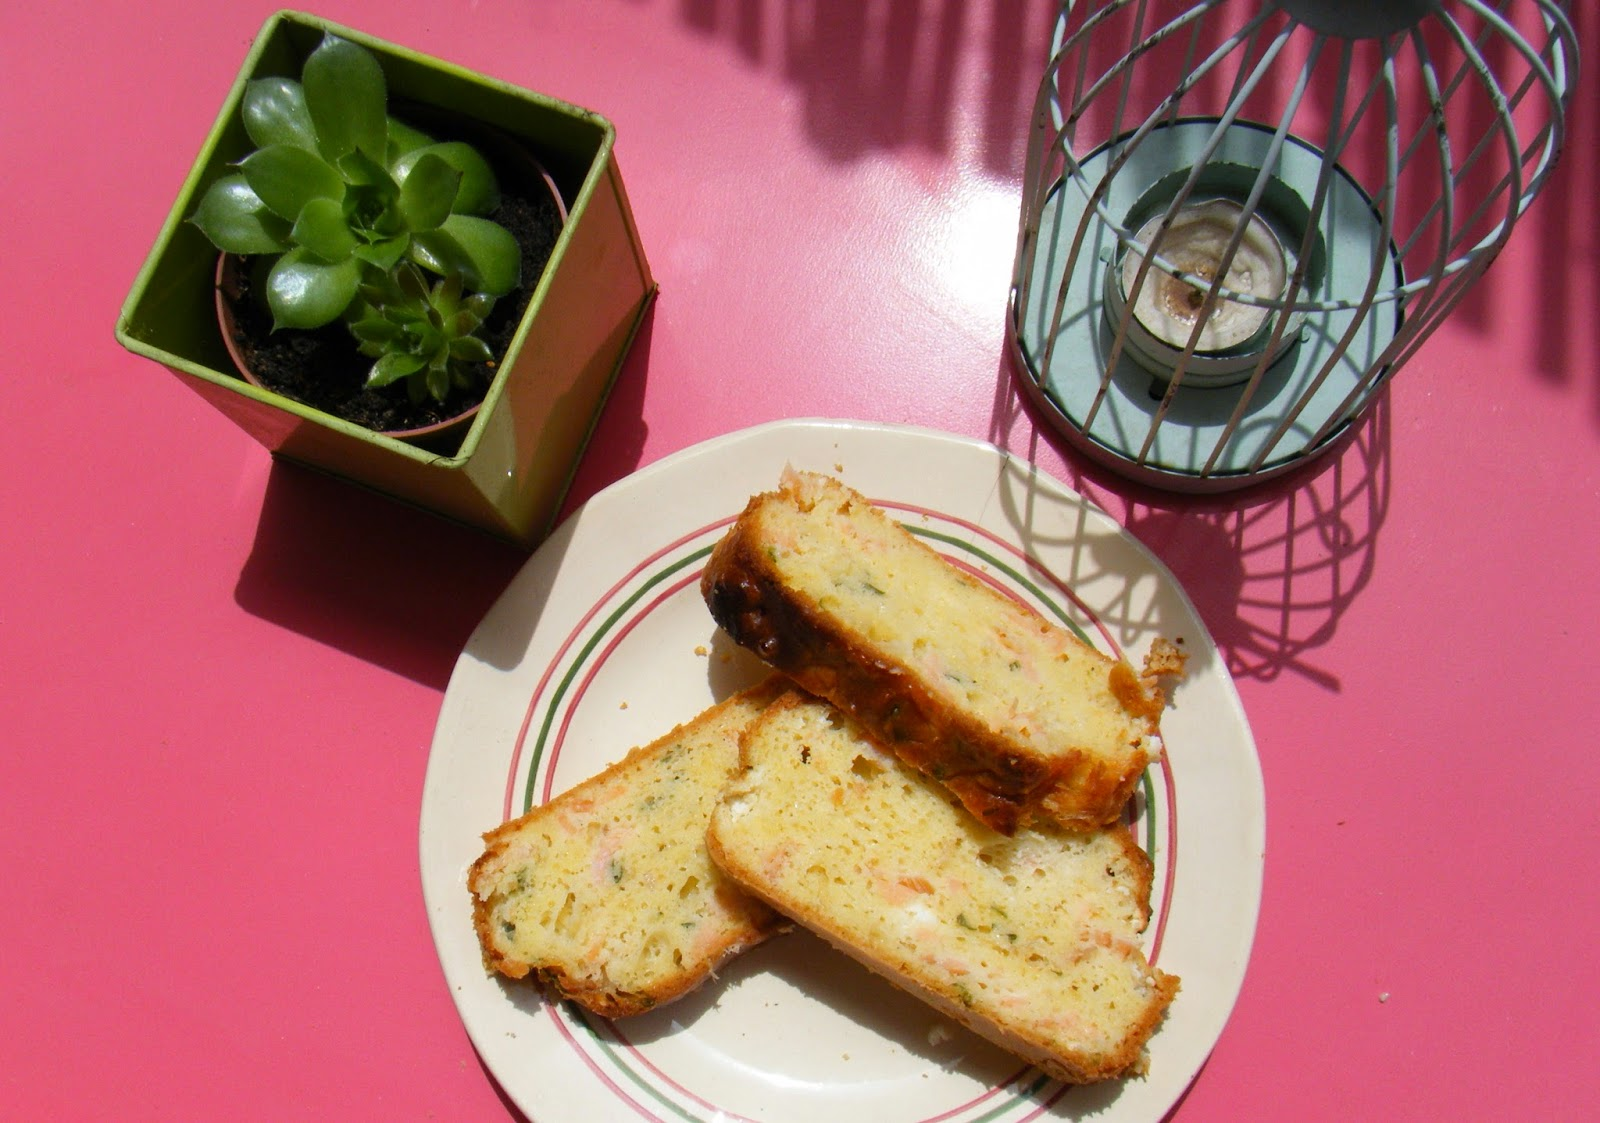 Recette Cake Saumon Olive Verte Gruyere